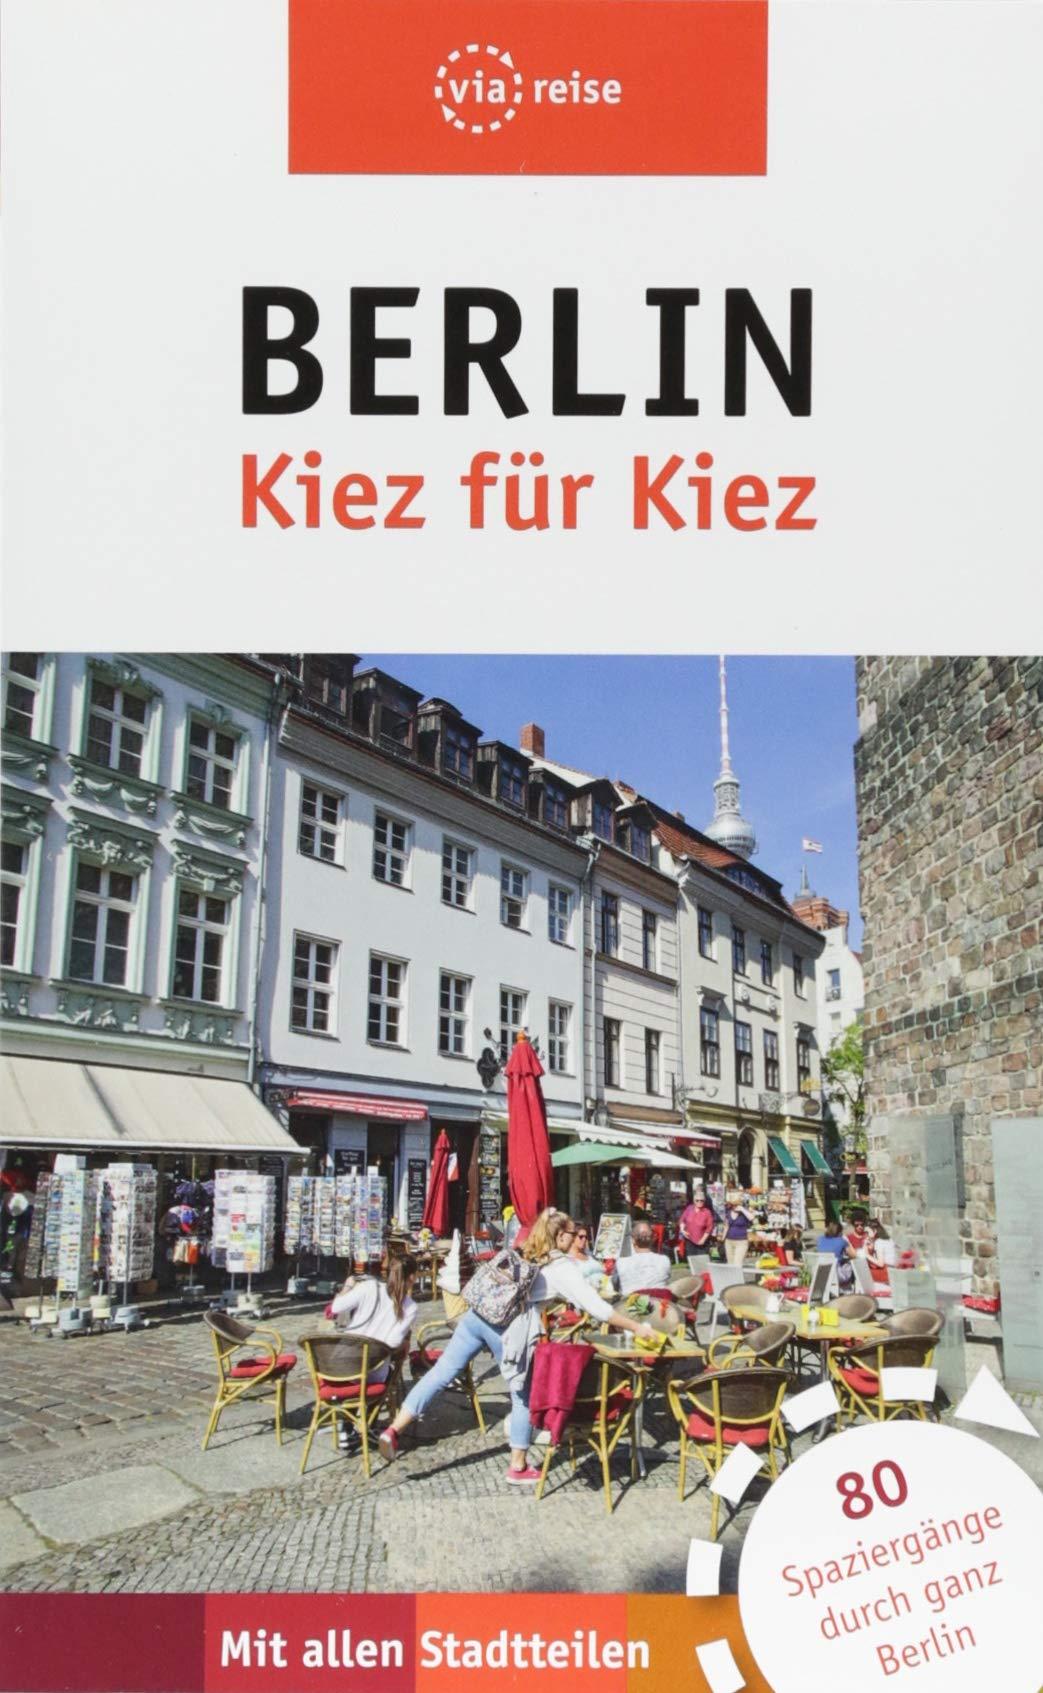 Berlin– Kiez für Kiez: 80 Spaziergänge durch ganz Berlin